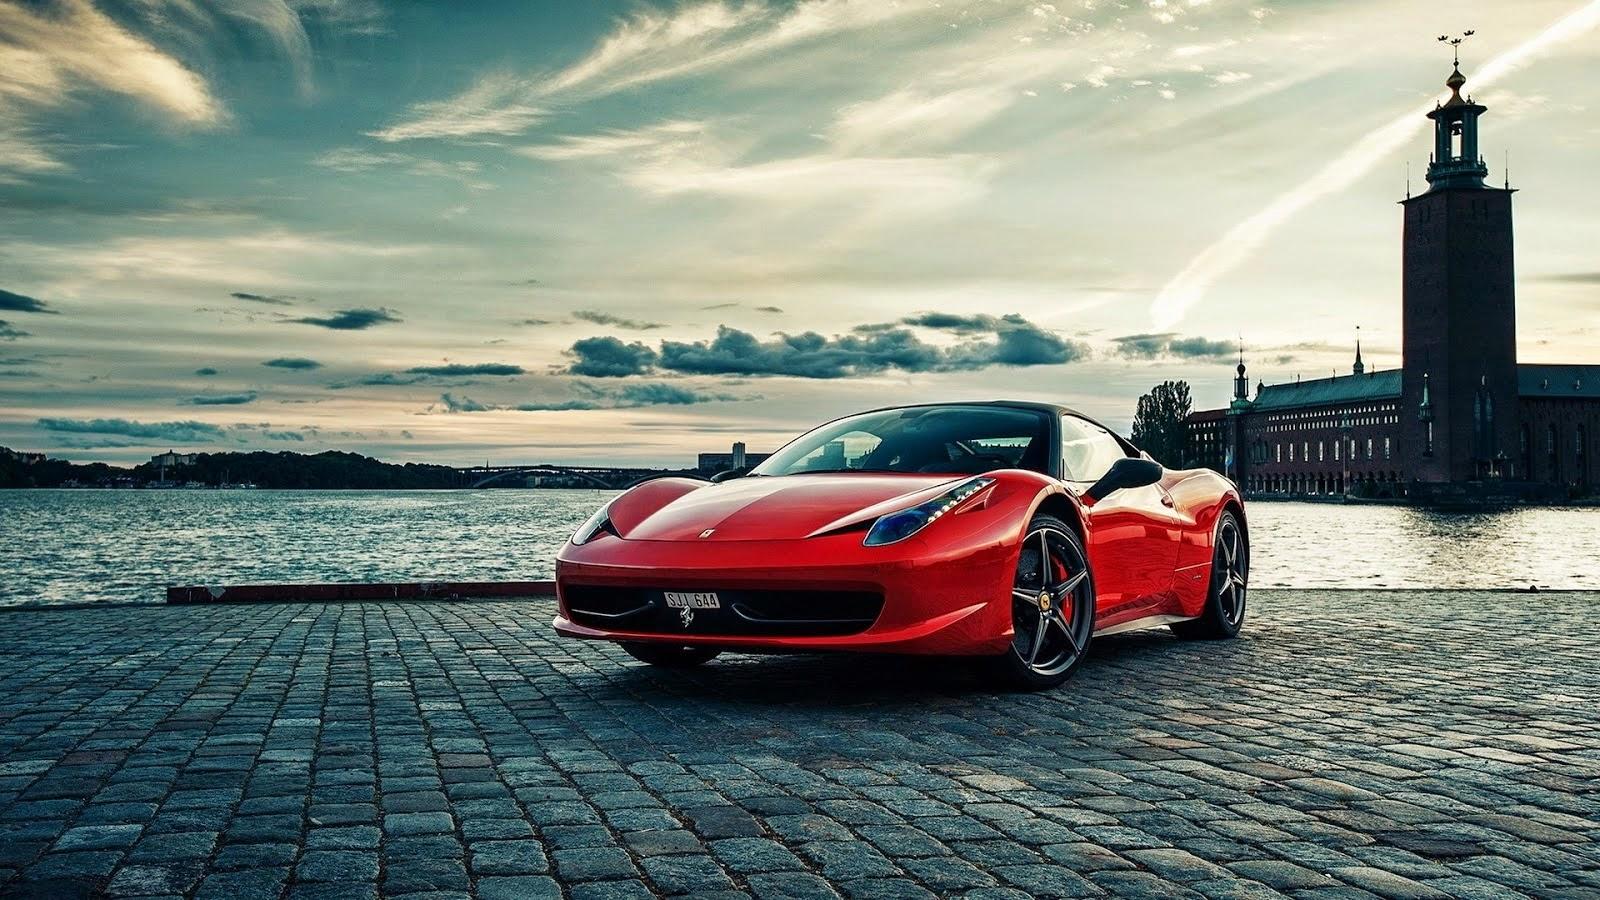 Koleksi Wallpaper Mobil Ferrari Gasebo Wallpaper